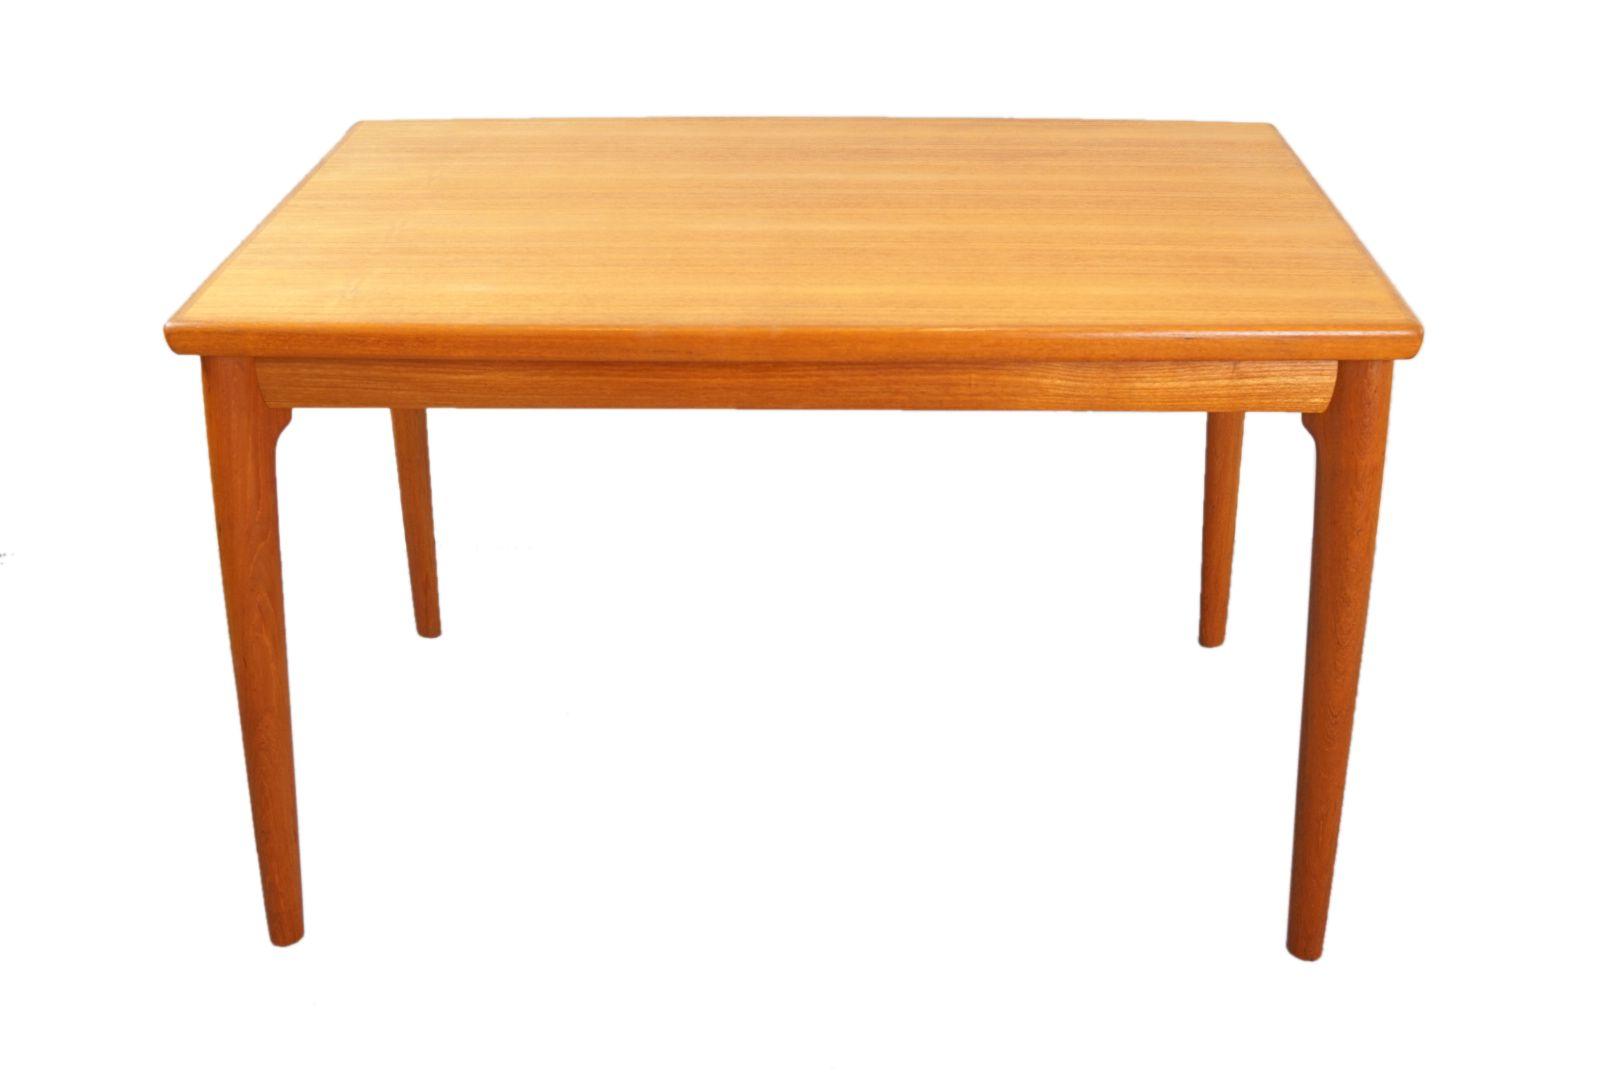 Vintage Extendable Teak Veneer Dining Table by Grete Jalk  : vintage extendable teak veneer dining table by grete jalk for glostrup 1 from www.pamono.com size 1616 x 1080 png 458kB